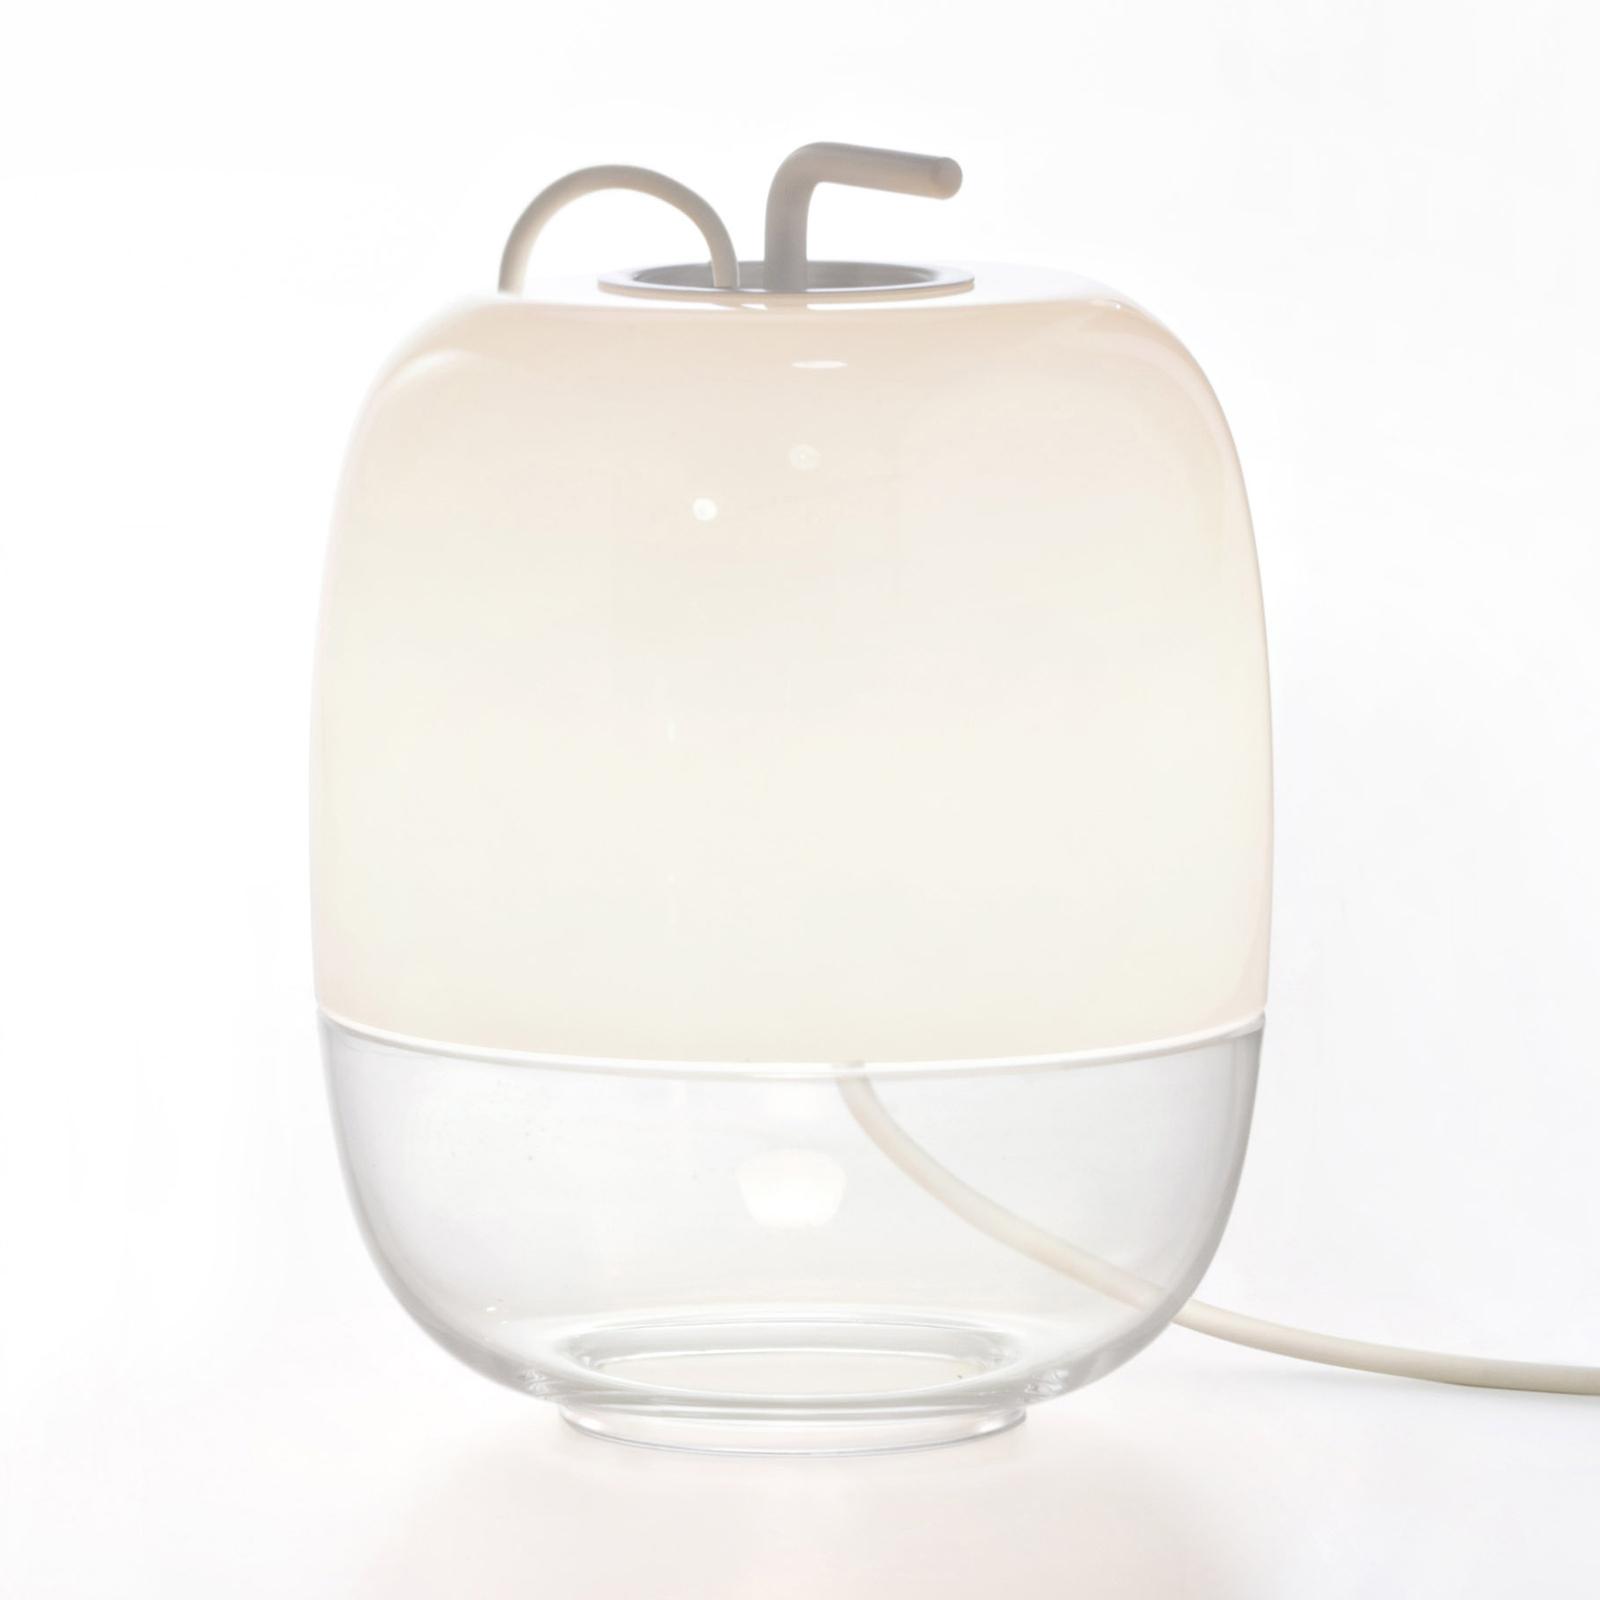 Prandina Gong T1 lampa stołowa biała